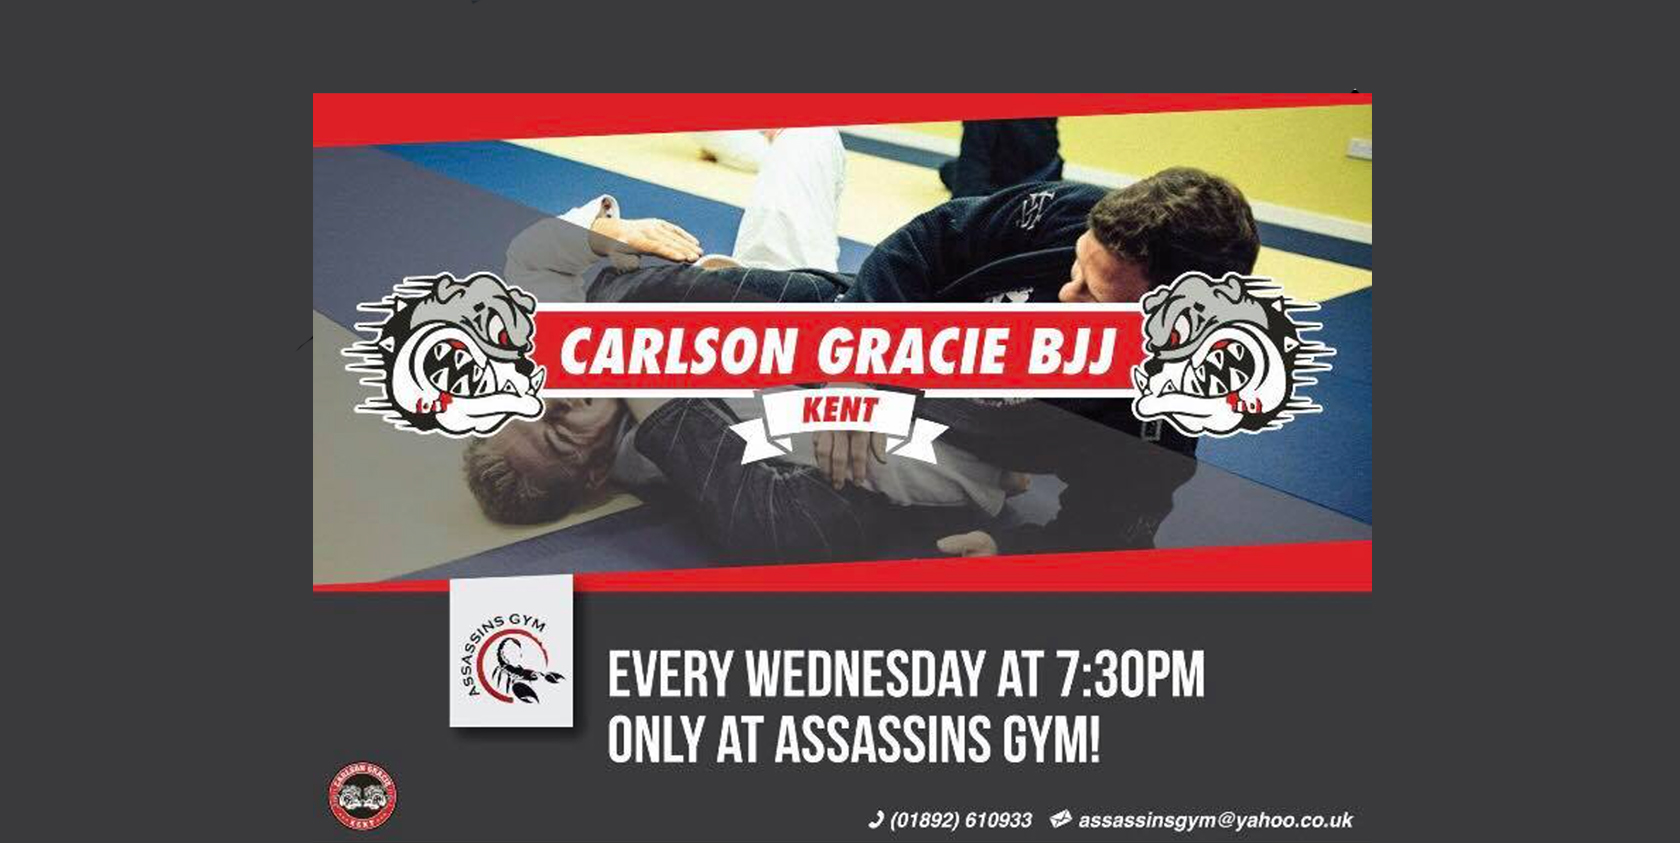 assassins gym, Carlson Gracie BJJ advert